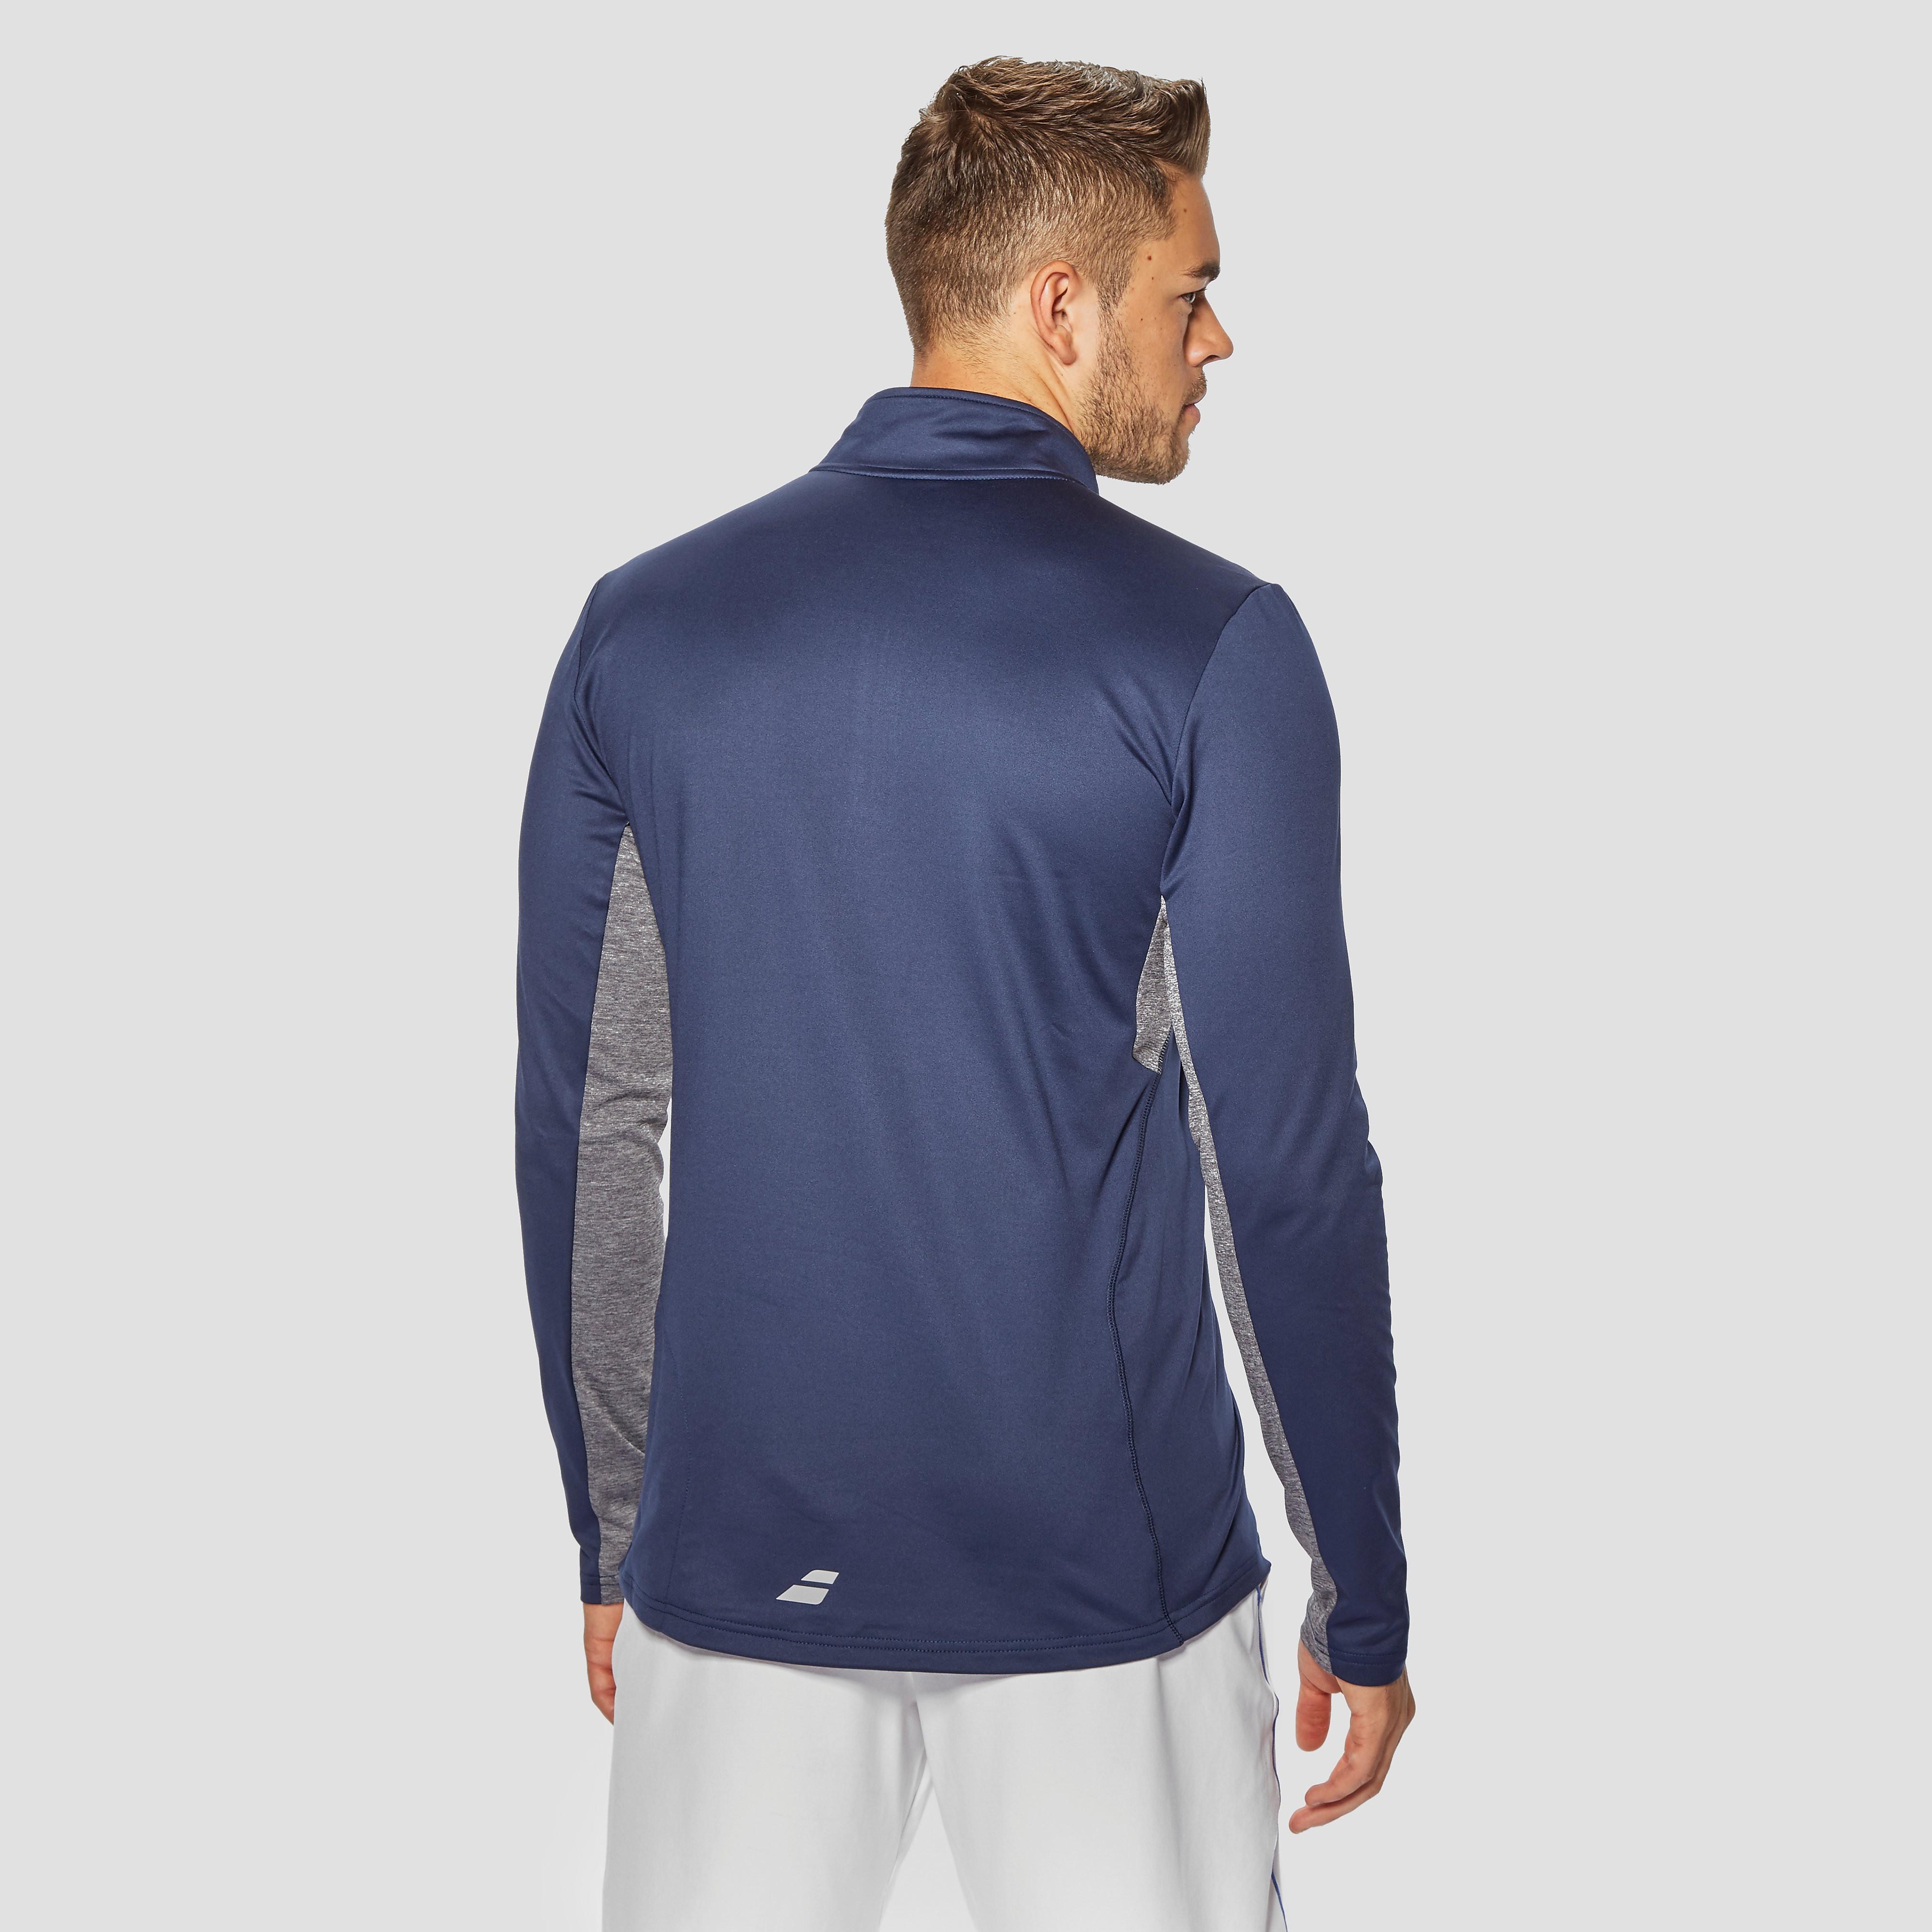 Babolat Wimbledon Core Half Zip